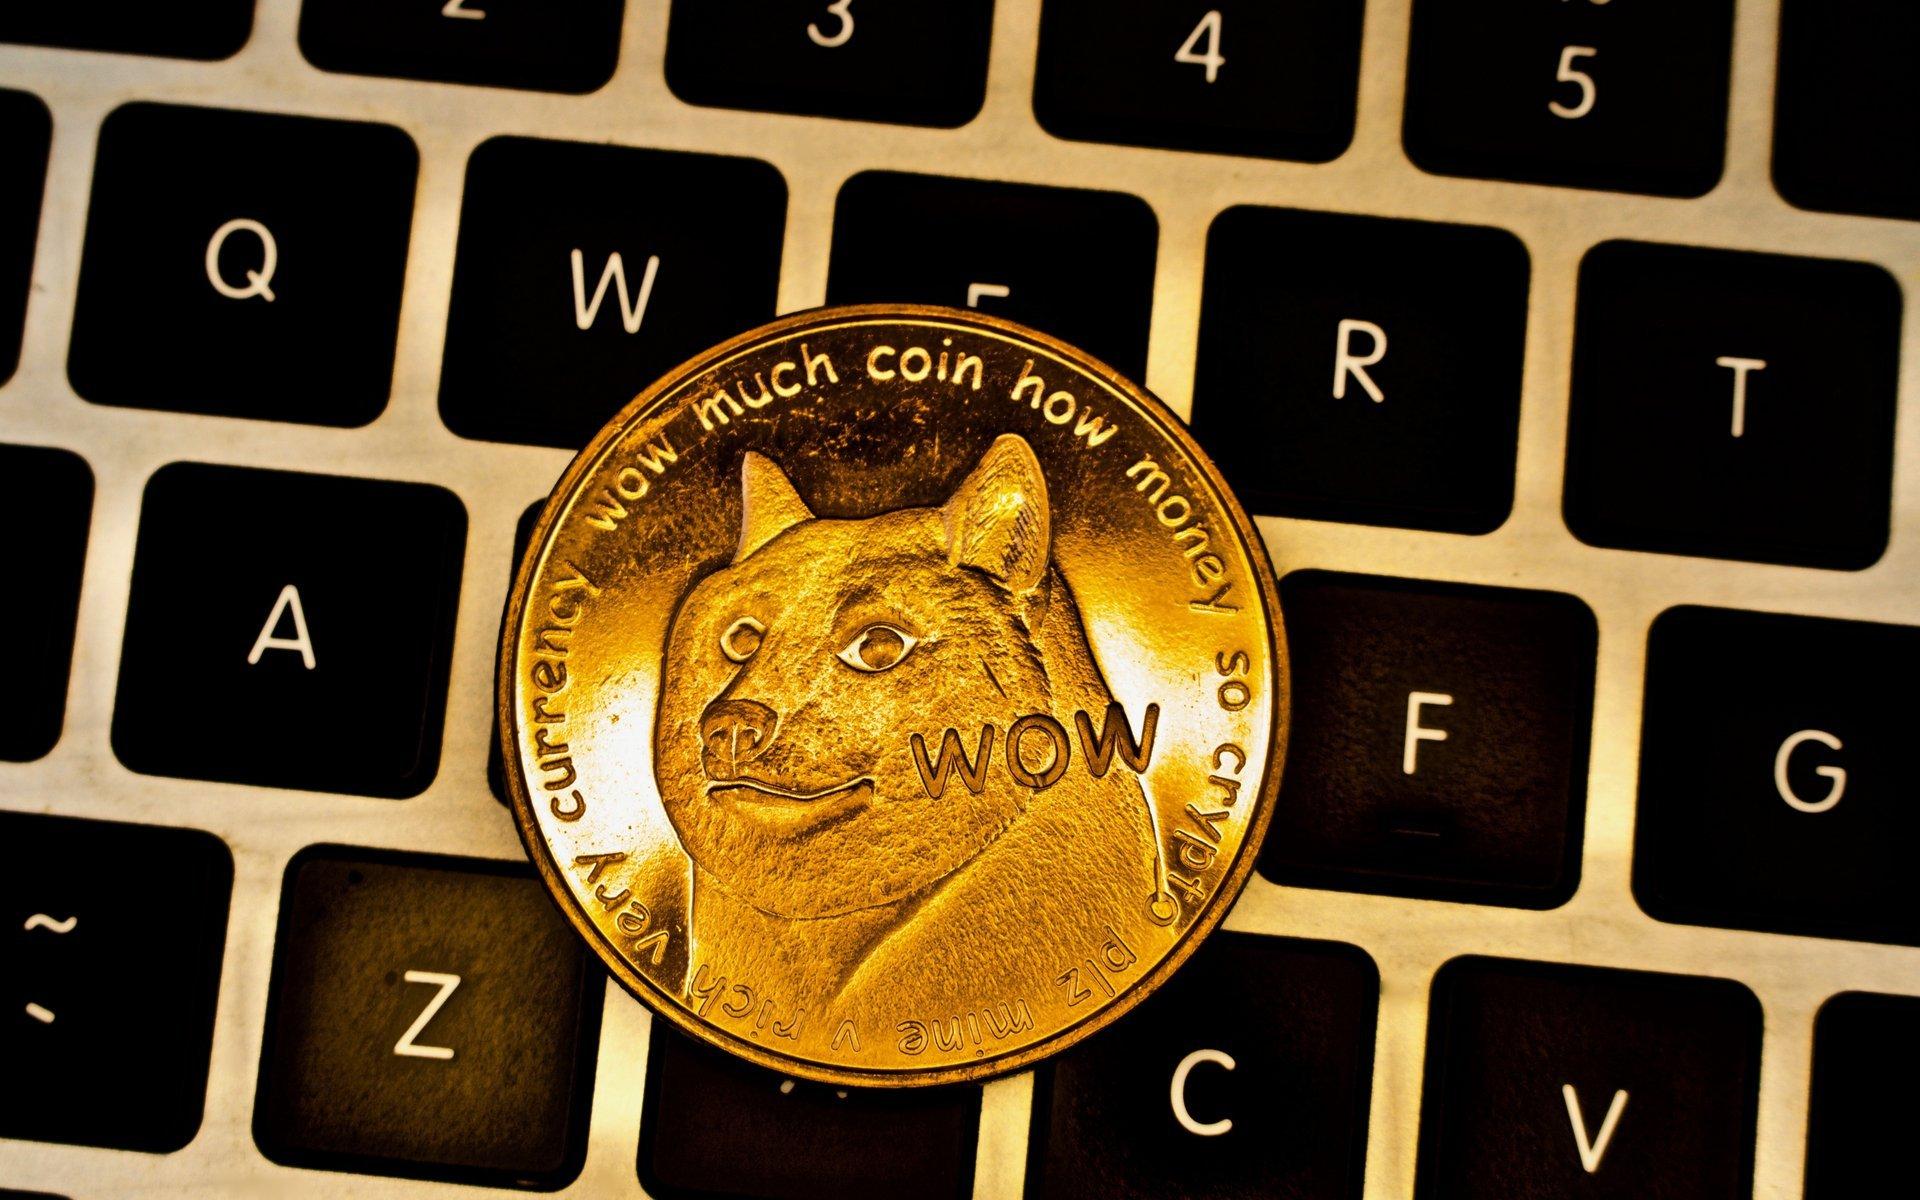 Dog coins vs bitcoins definition lazio vs chievo betting expert nba